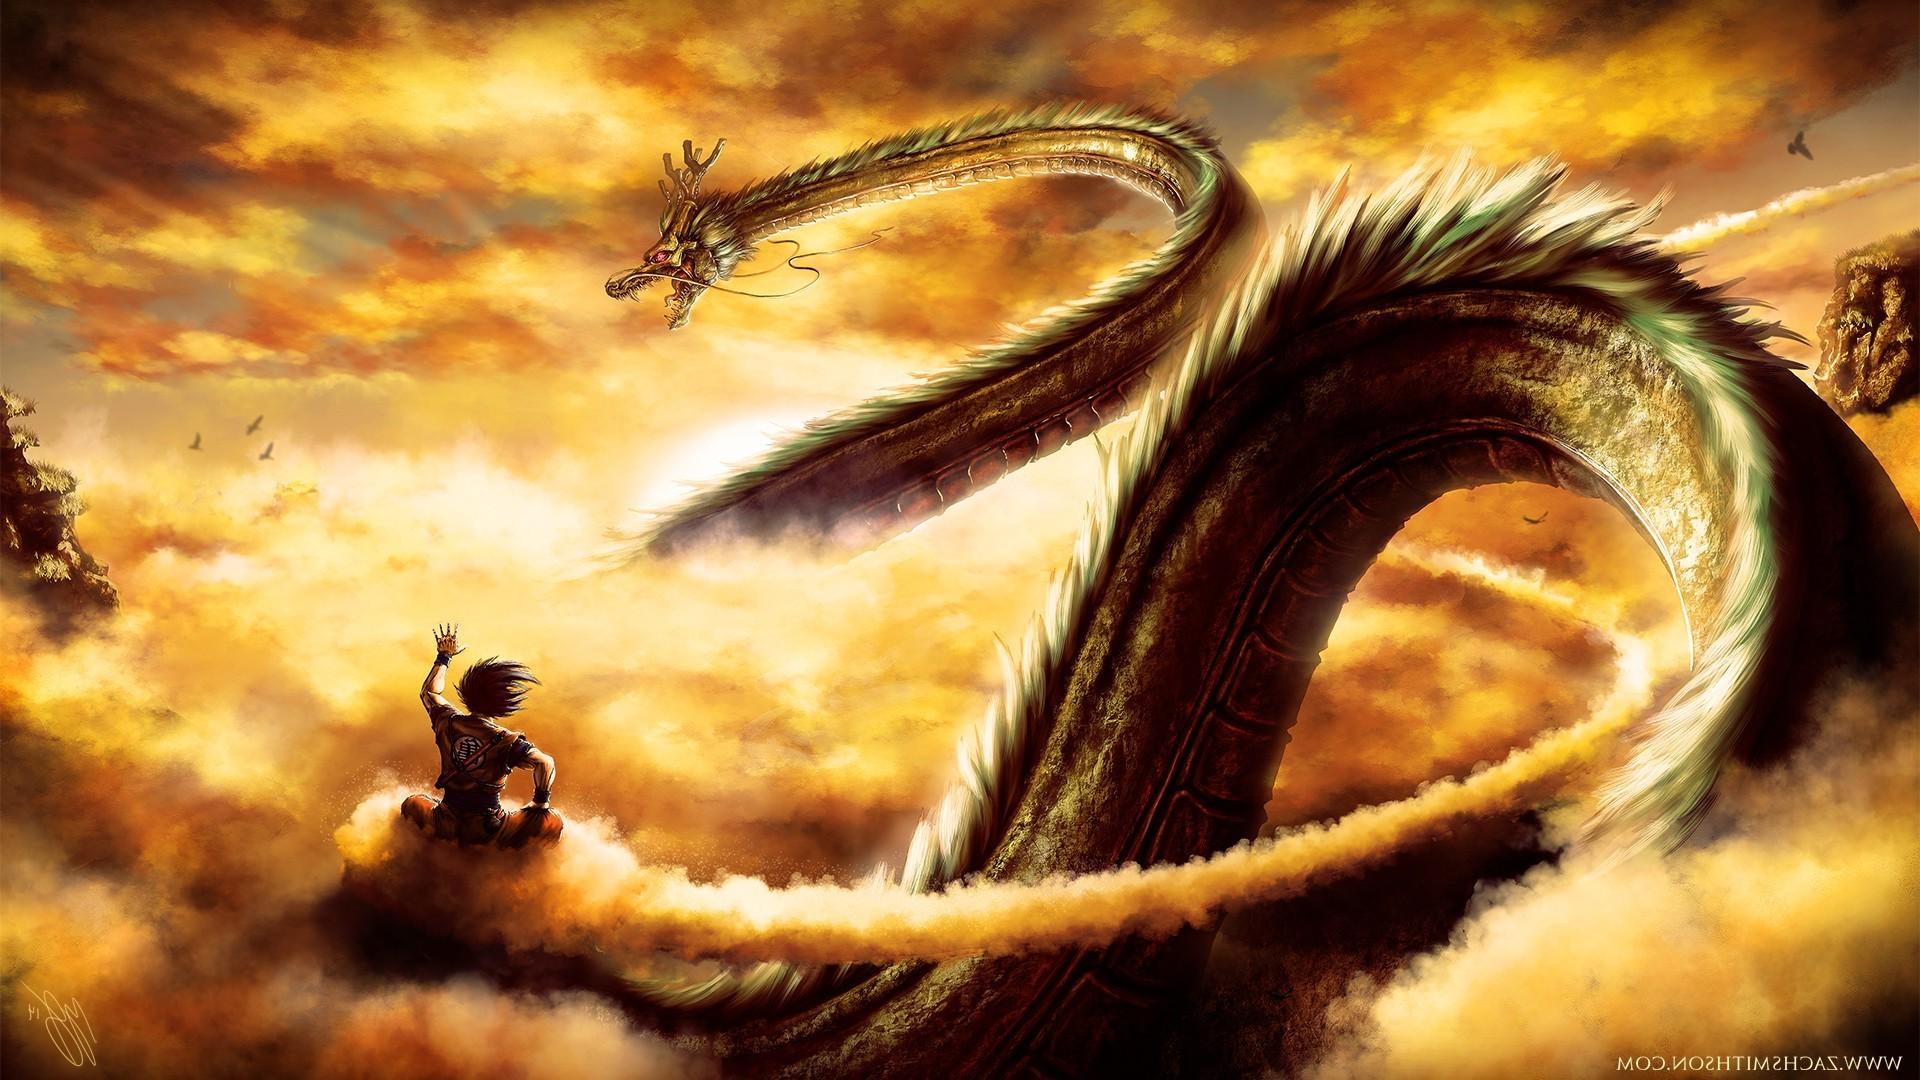 Dragon Ball Z Wallpaper Hd 71 Pictures